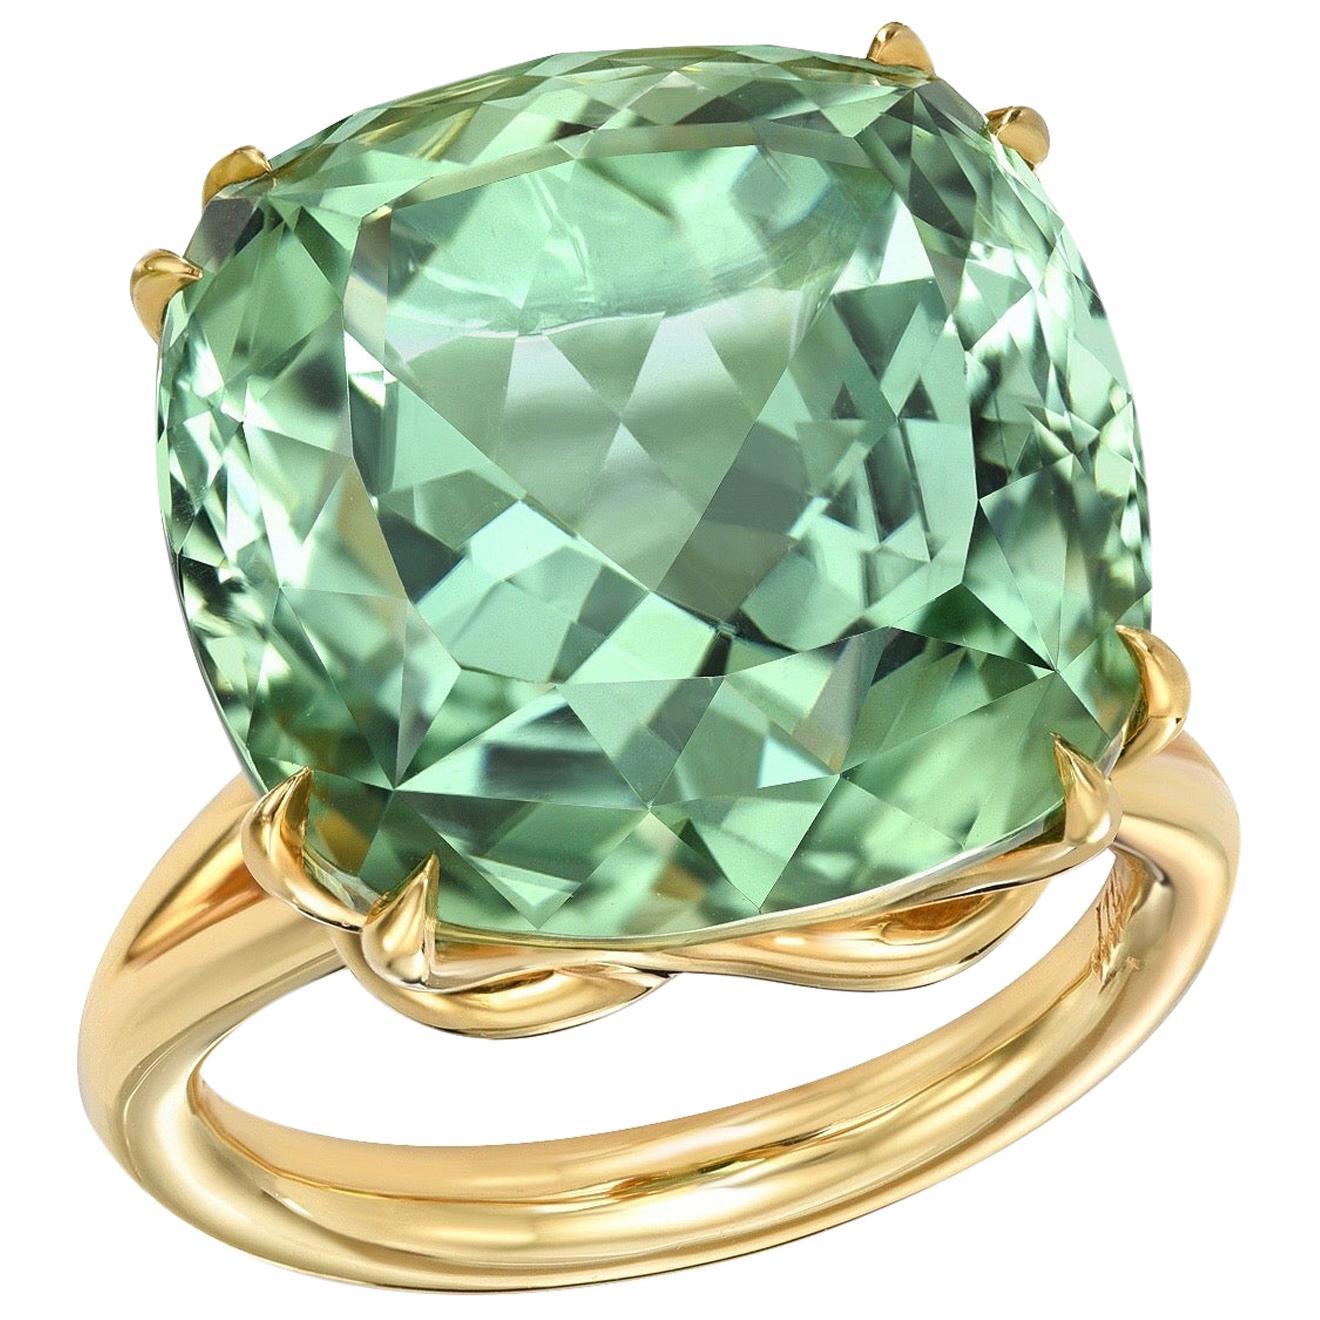 Mint Green Tourmaline Ring 18.04 Carat